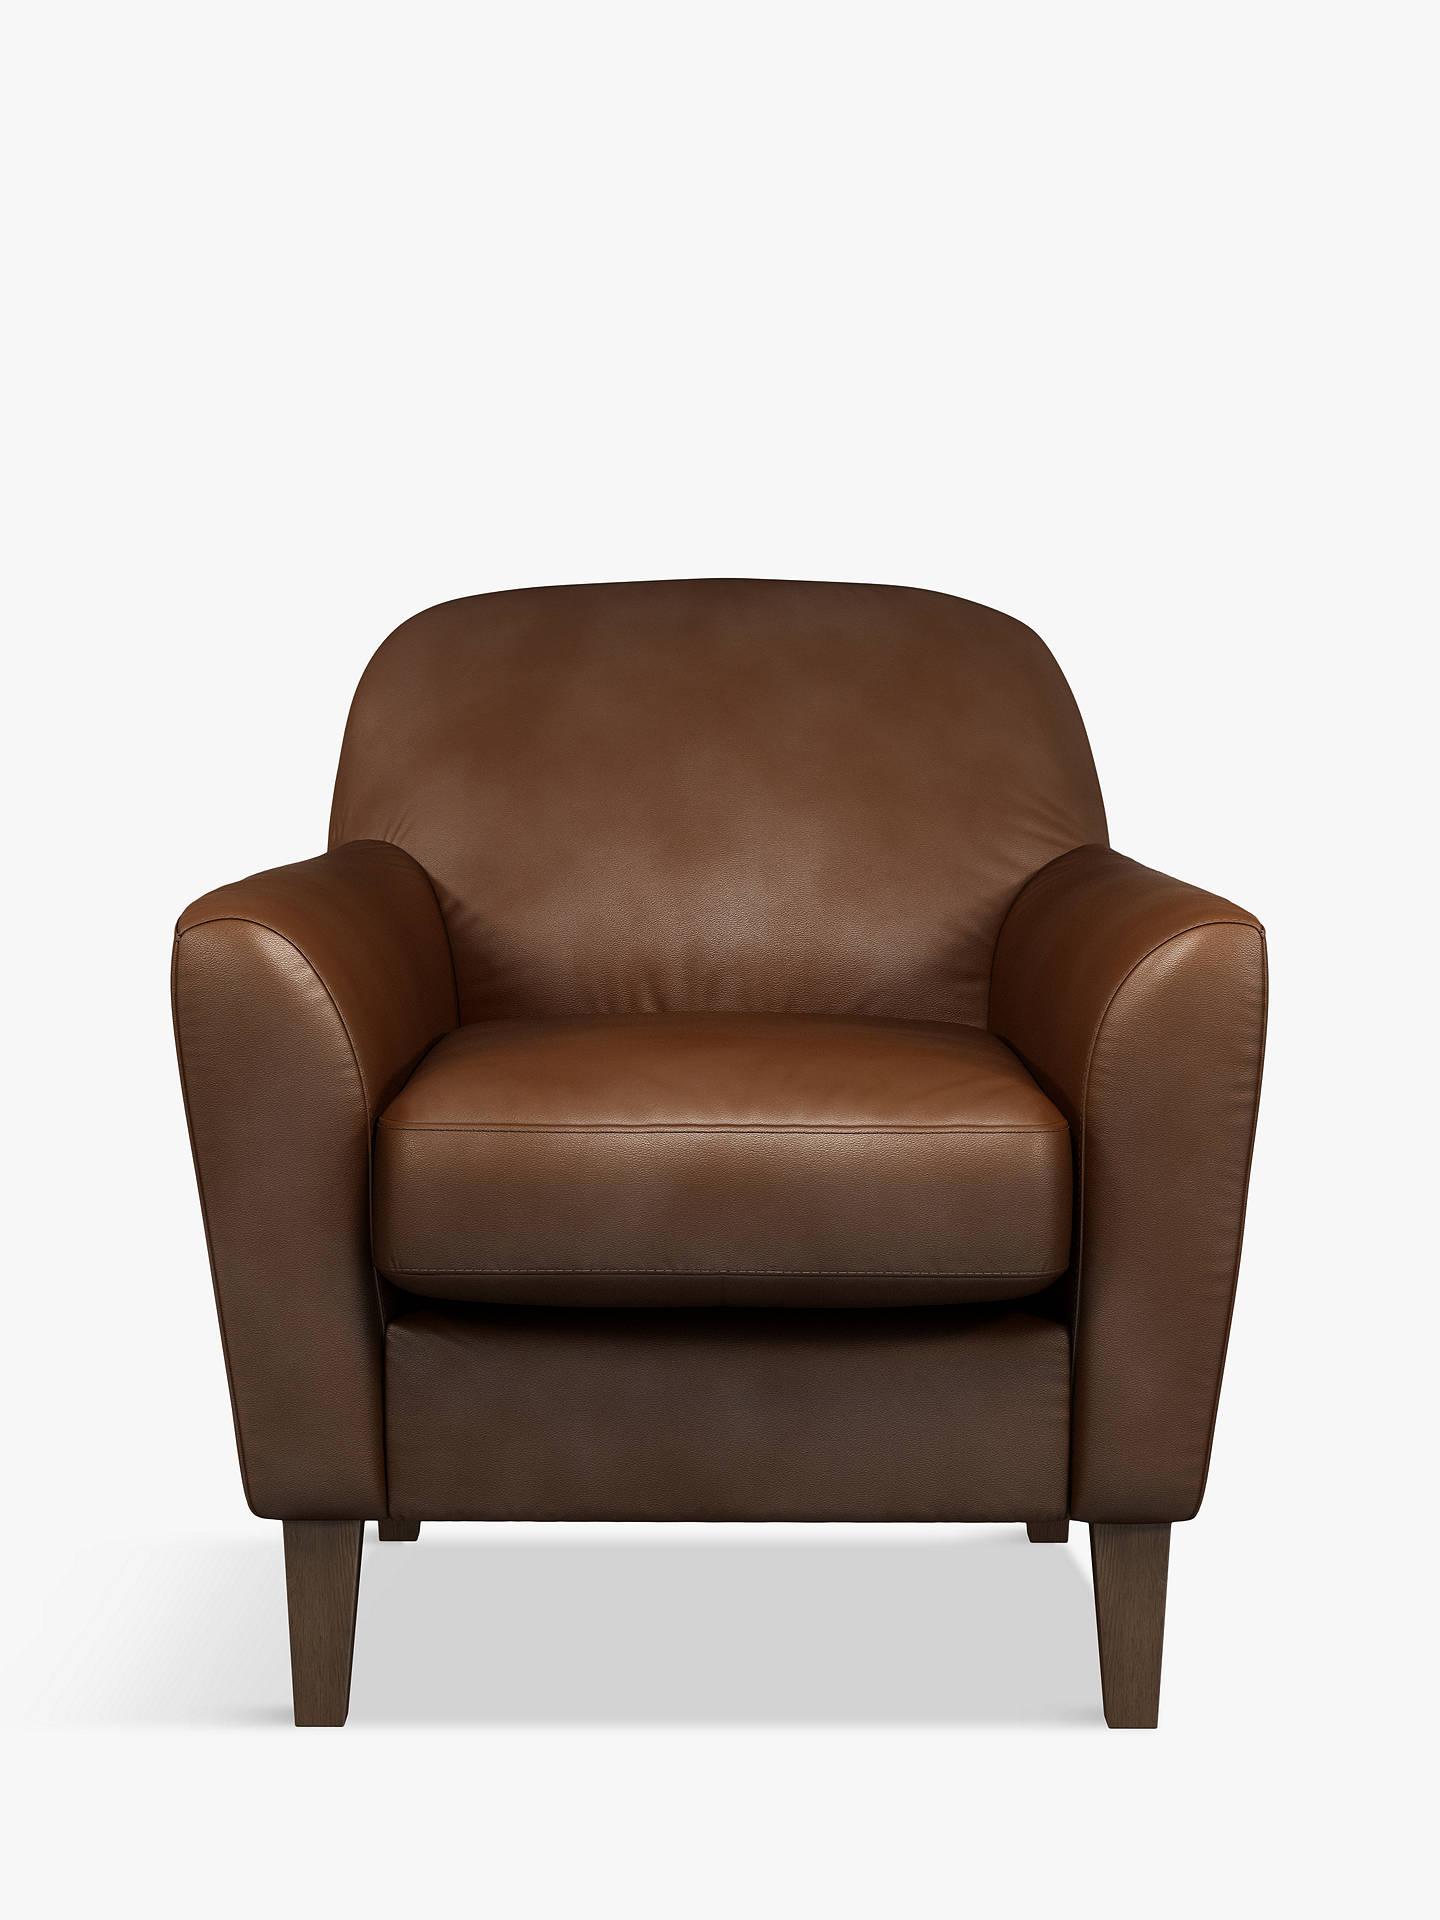 Tremendous John Lewis Partners Connor Leather Armchair Dark Leg Contempo Castanga Inzonedesignstudio Interior Chair Design Inzonedesignstudiocom